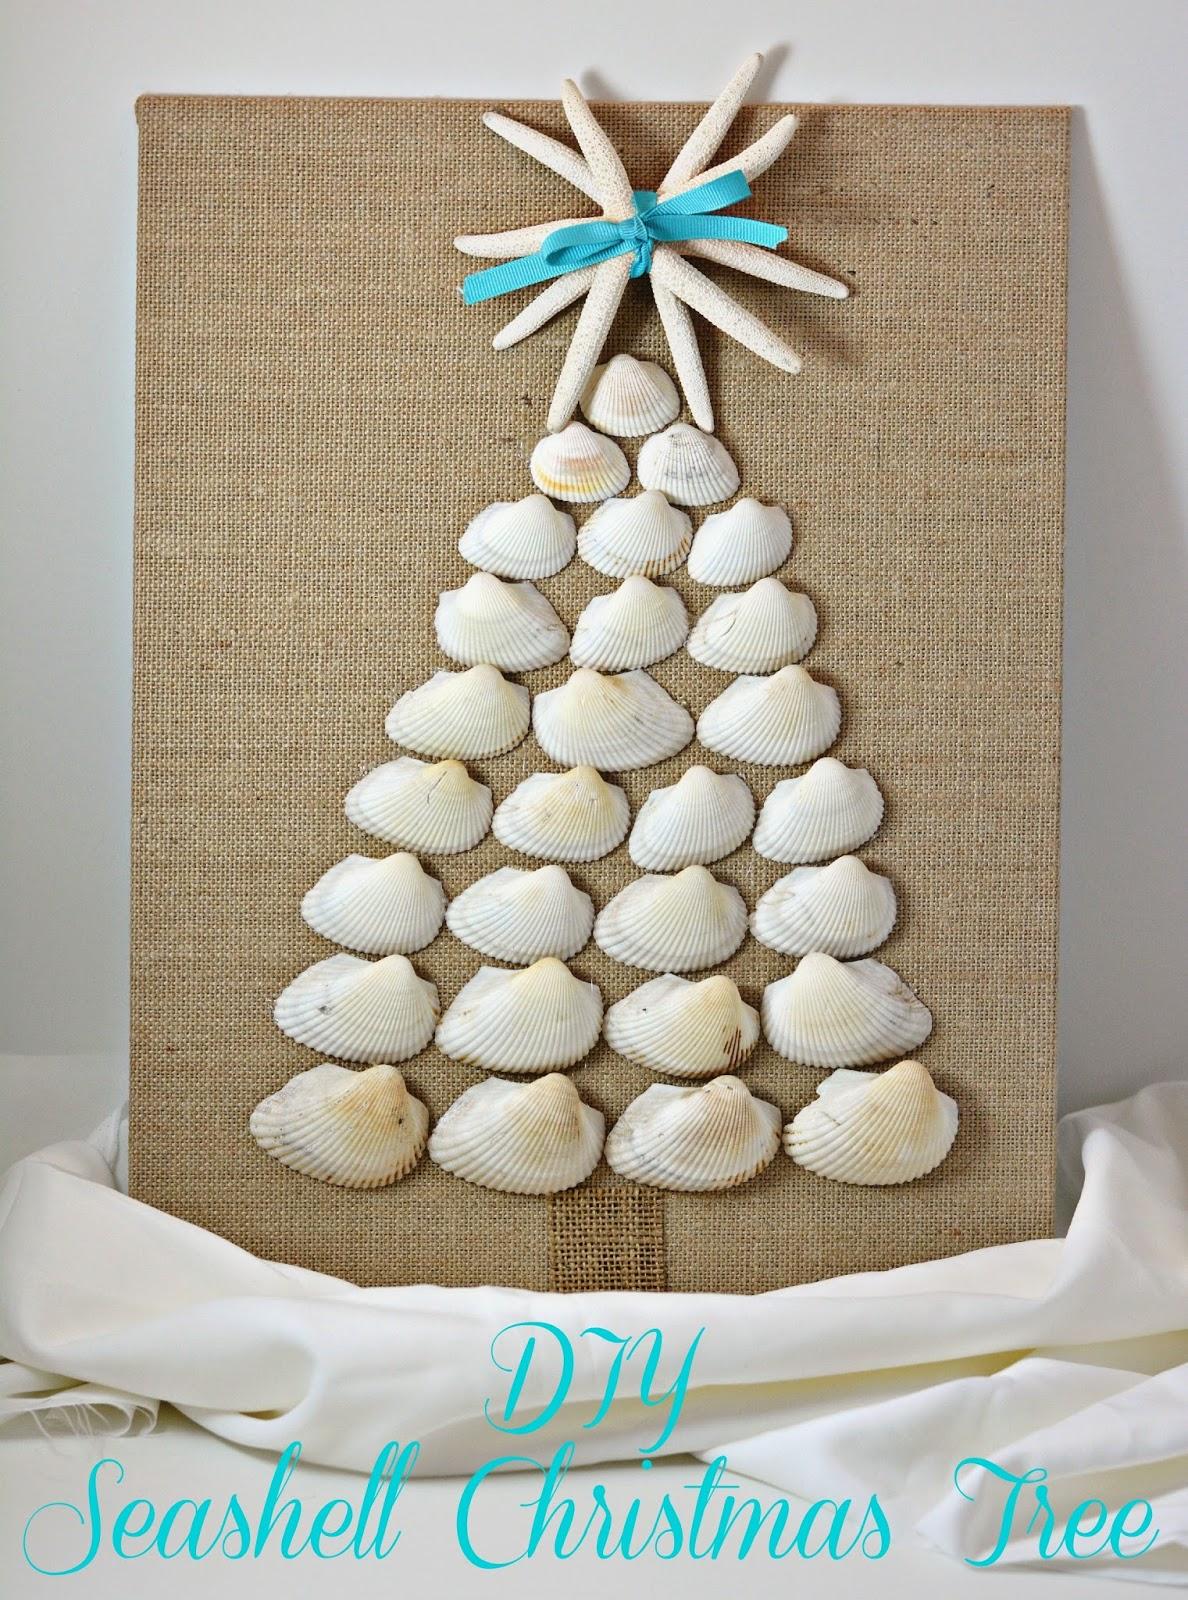 Life With 4 Boys: DIY Seashell Christmas Tree Canvas Board #Crafts